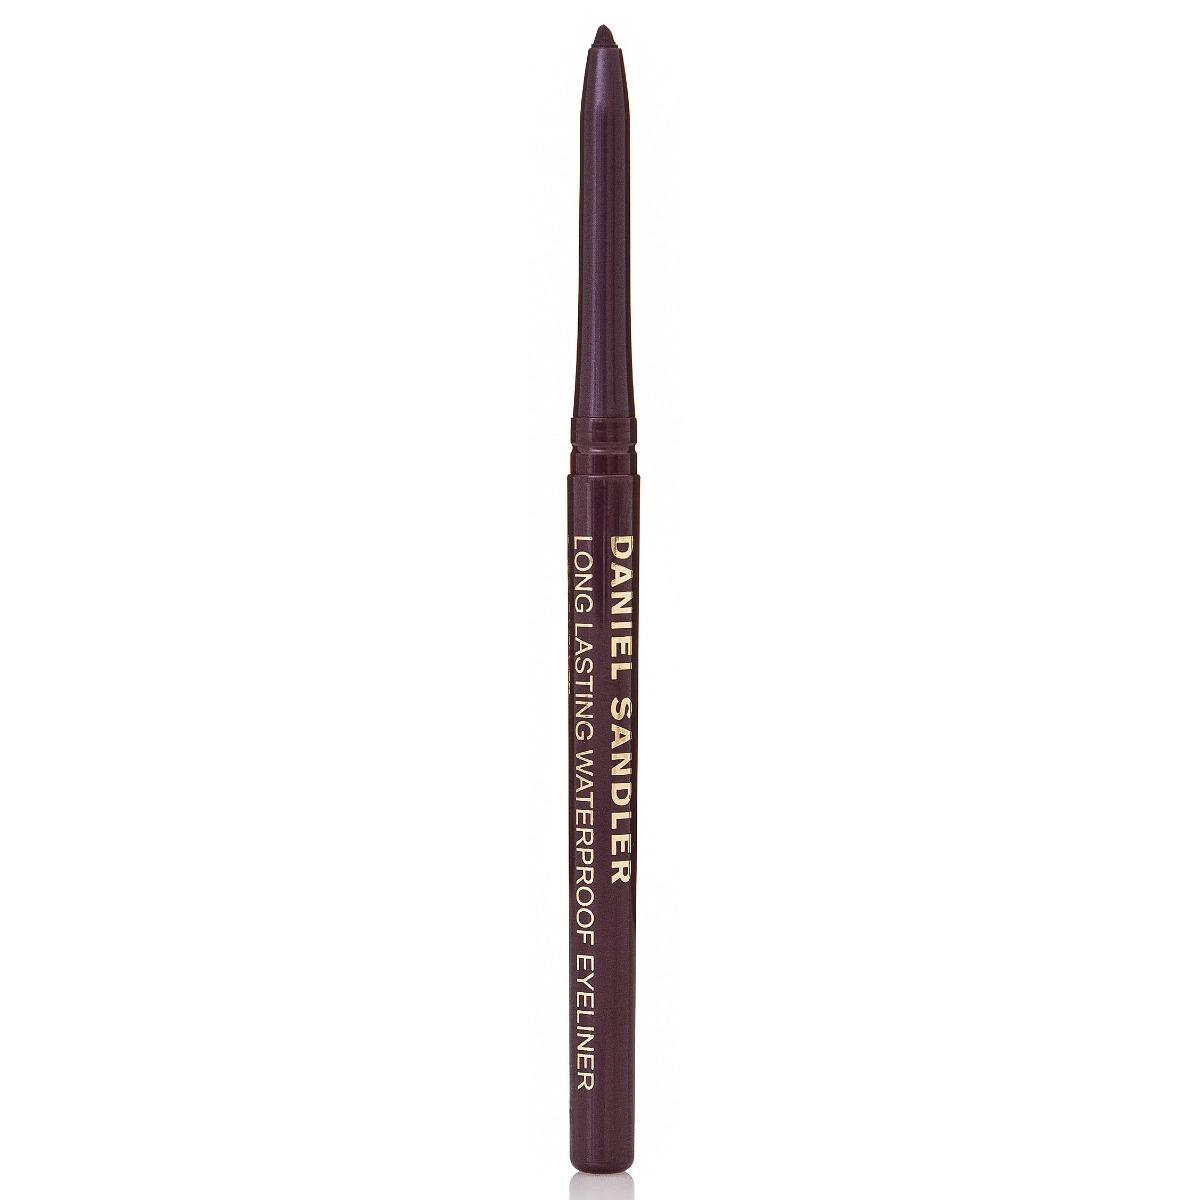 Daniel Sandler Long Lasting Waterproof Eyeliner - Purple Velvet 0.35g